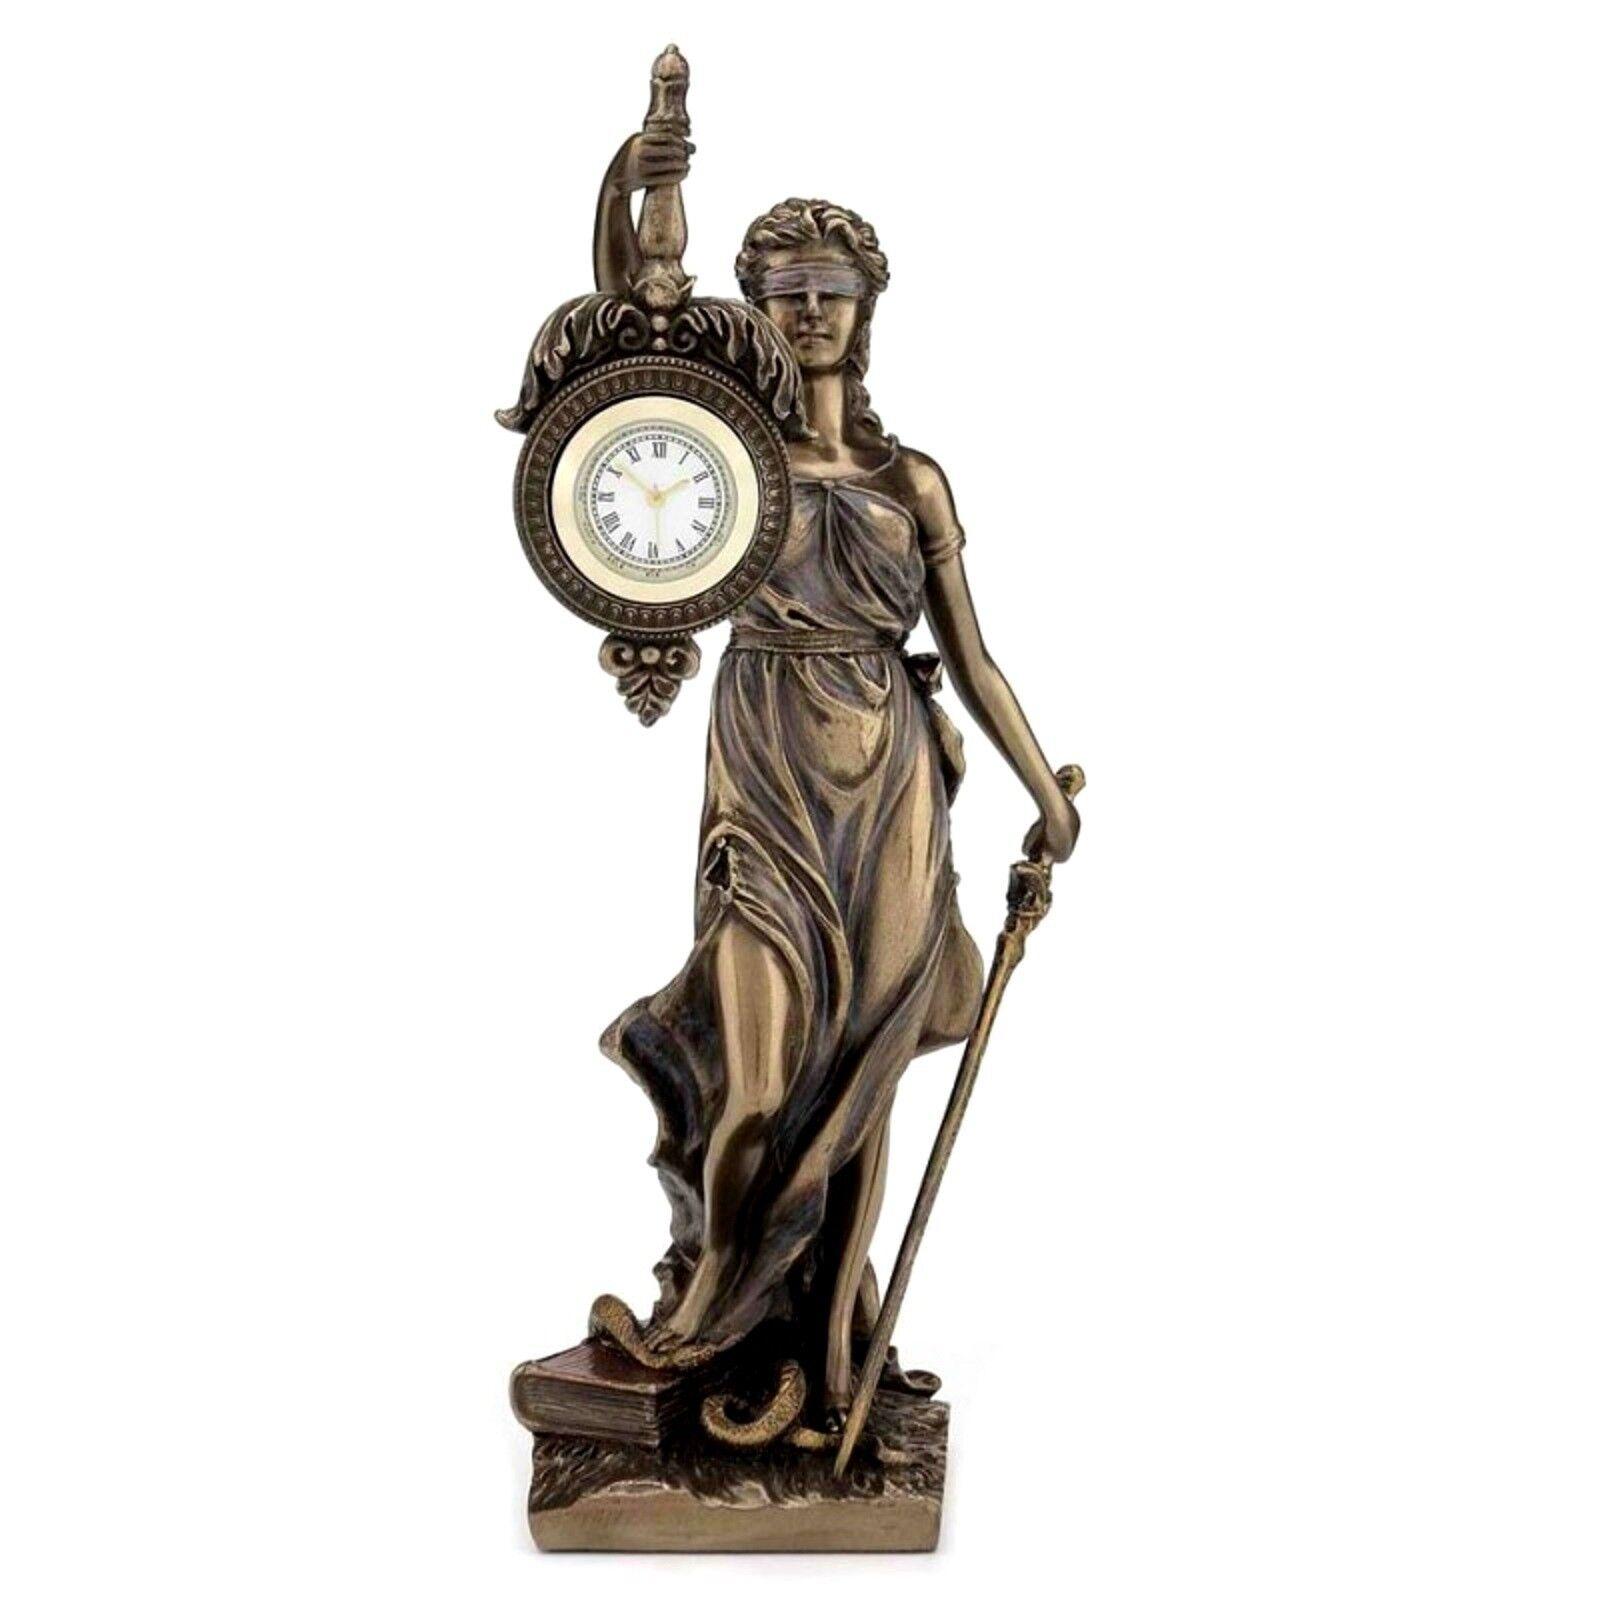 30197   FIGURINE STATUETTE   STATUE LA JUSTICE PENDULE  STYLE    BRONZE  10%